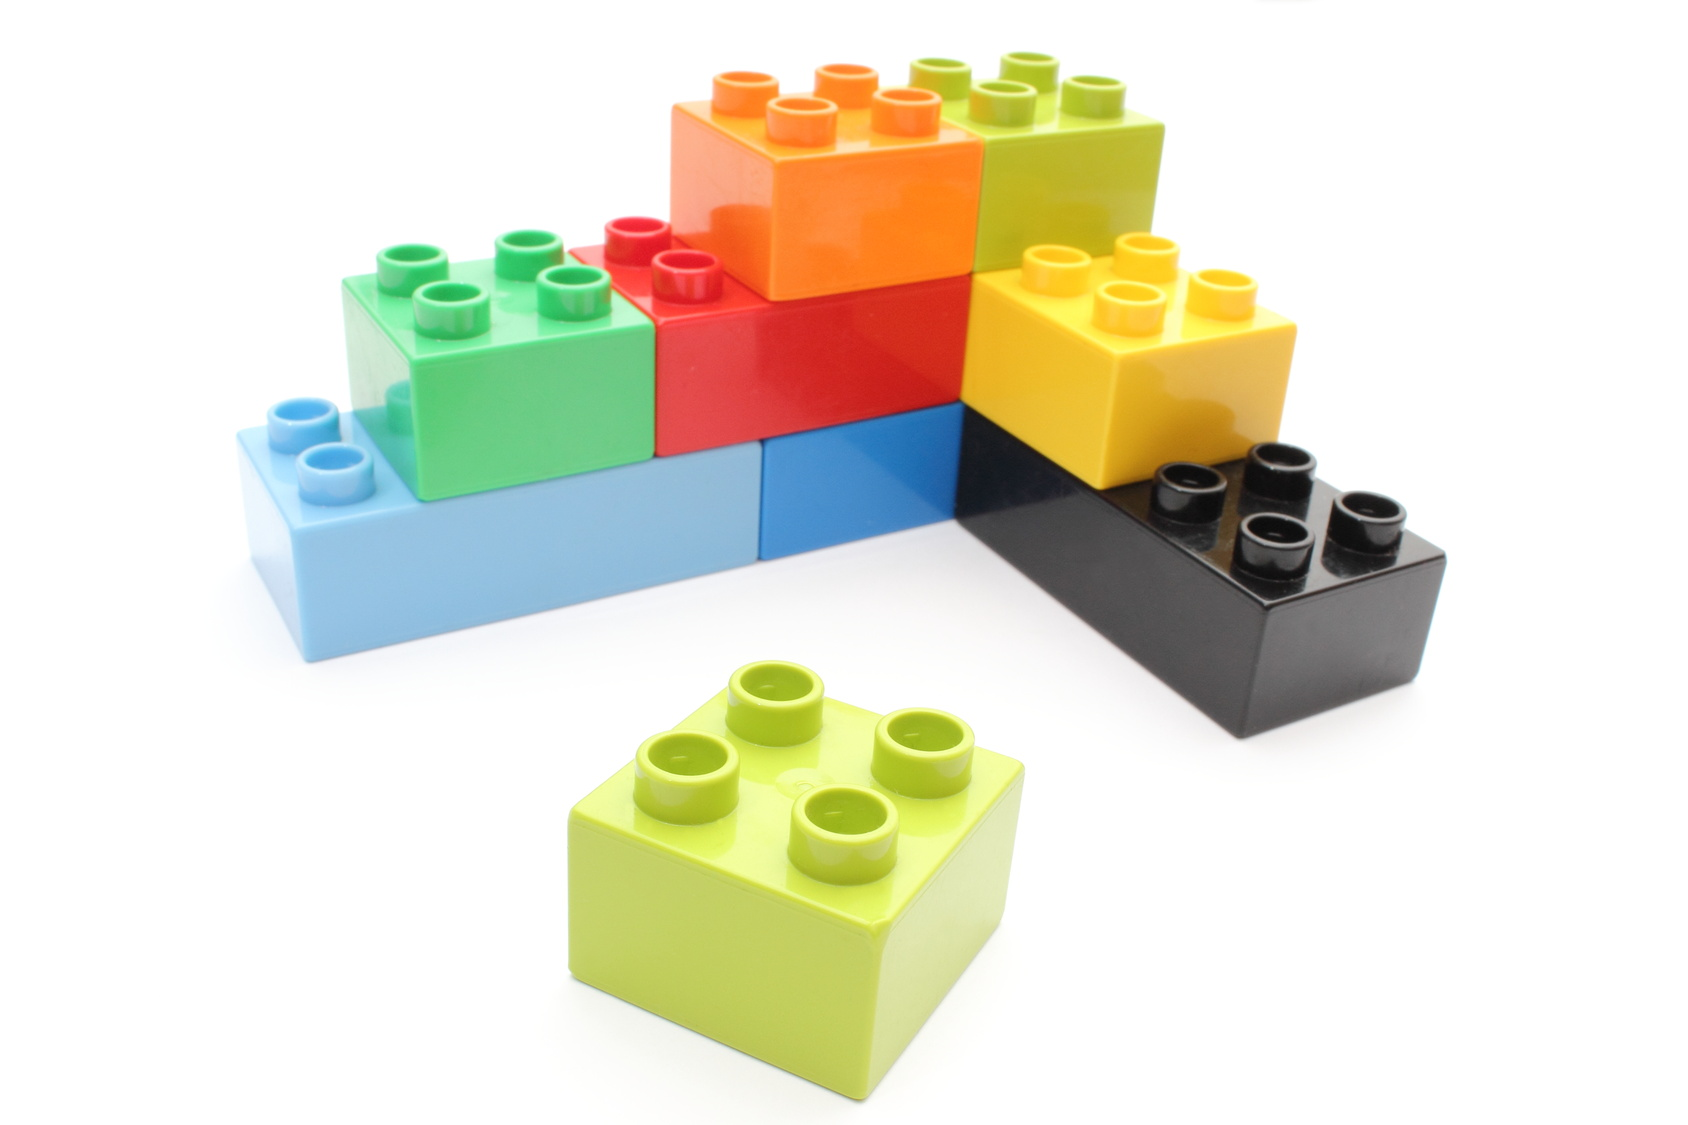 Assembling lego blocks